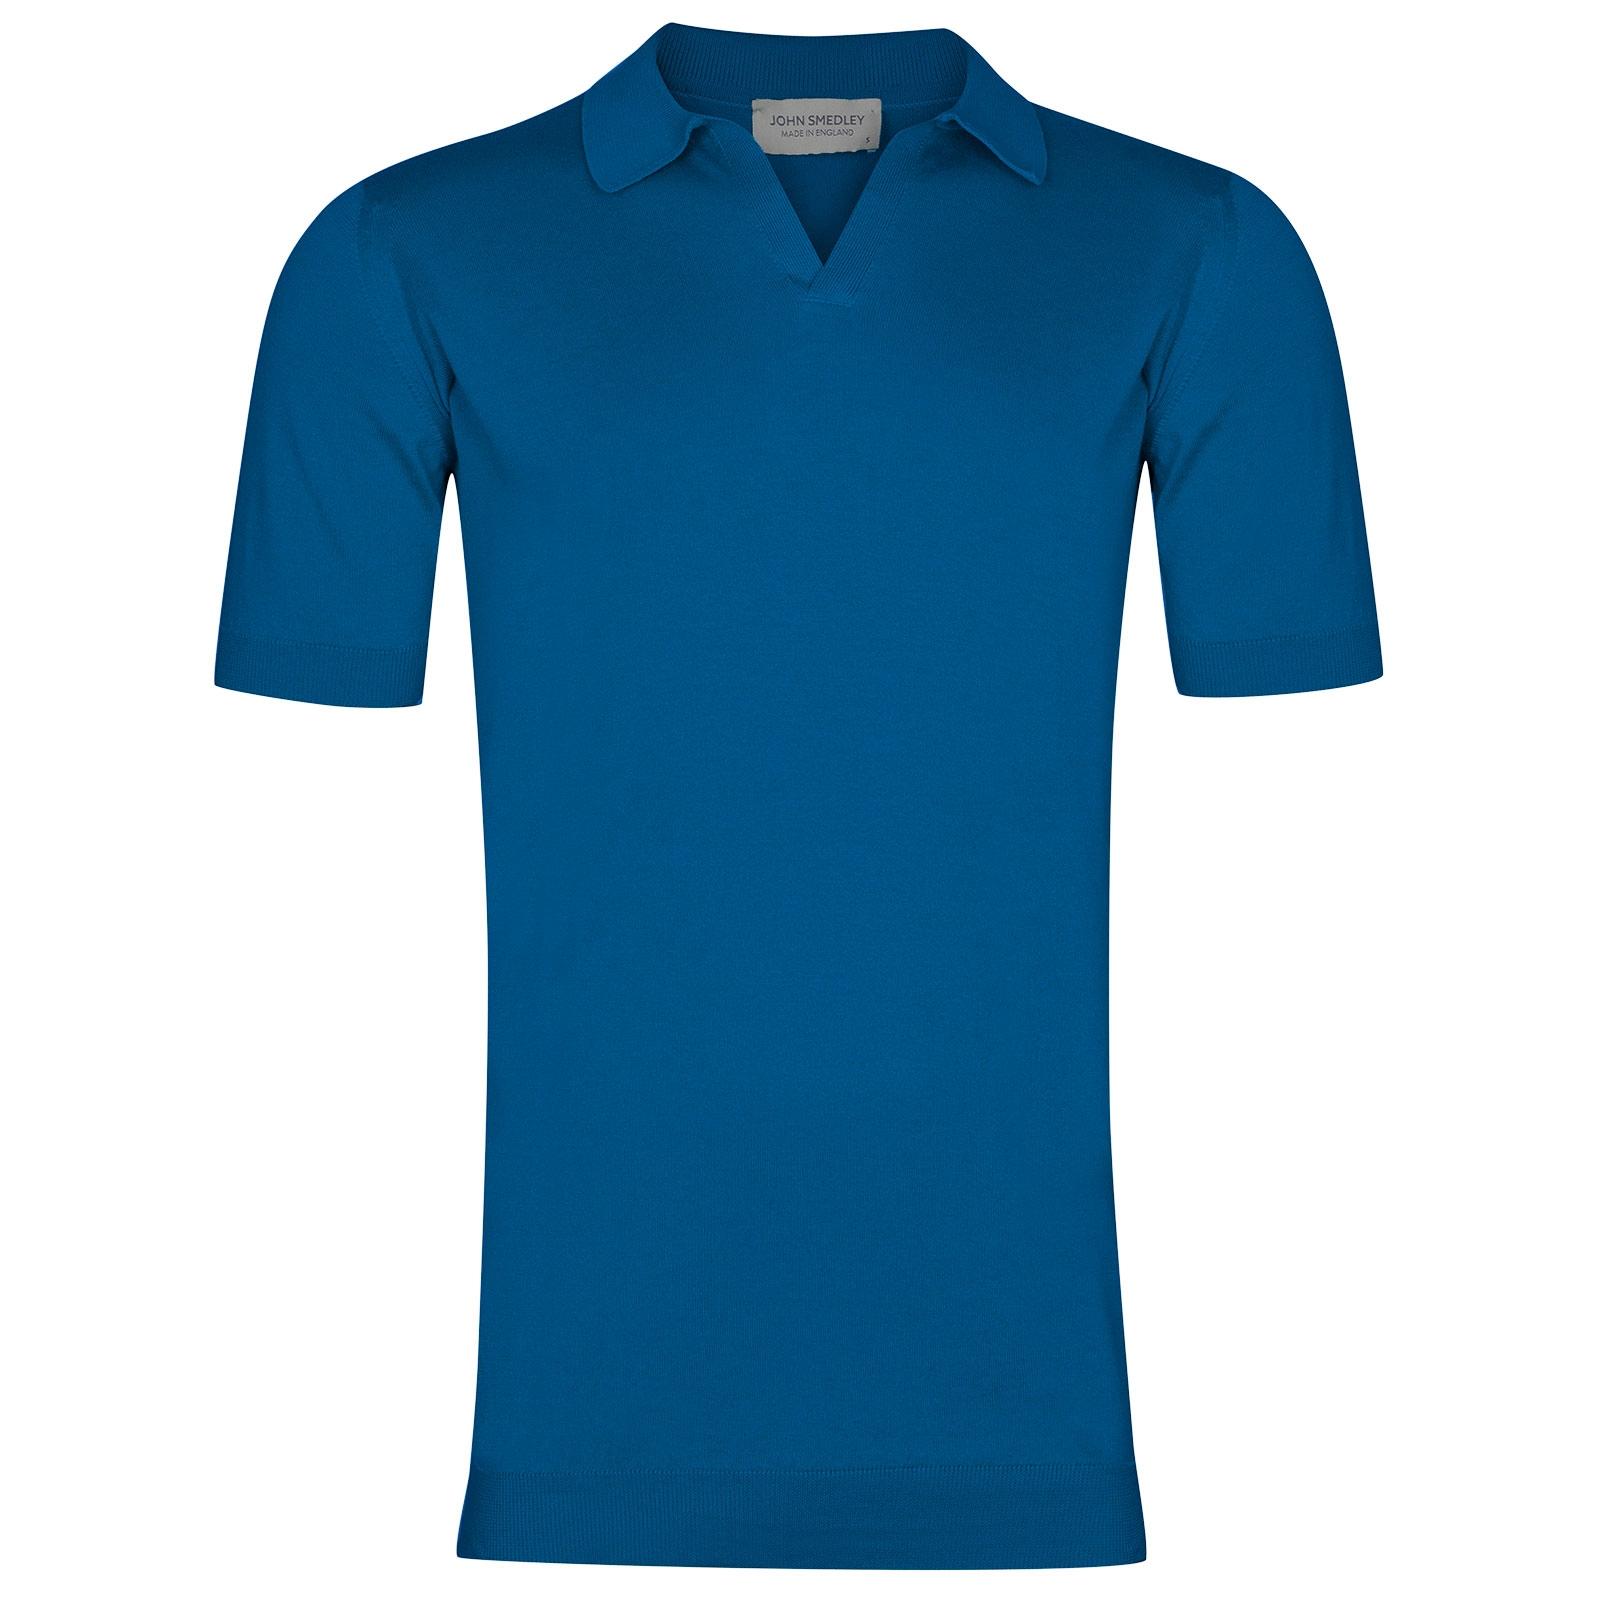 John Smedley Noah in Statice Blue Shirt-LGE